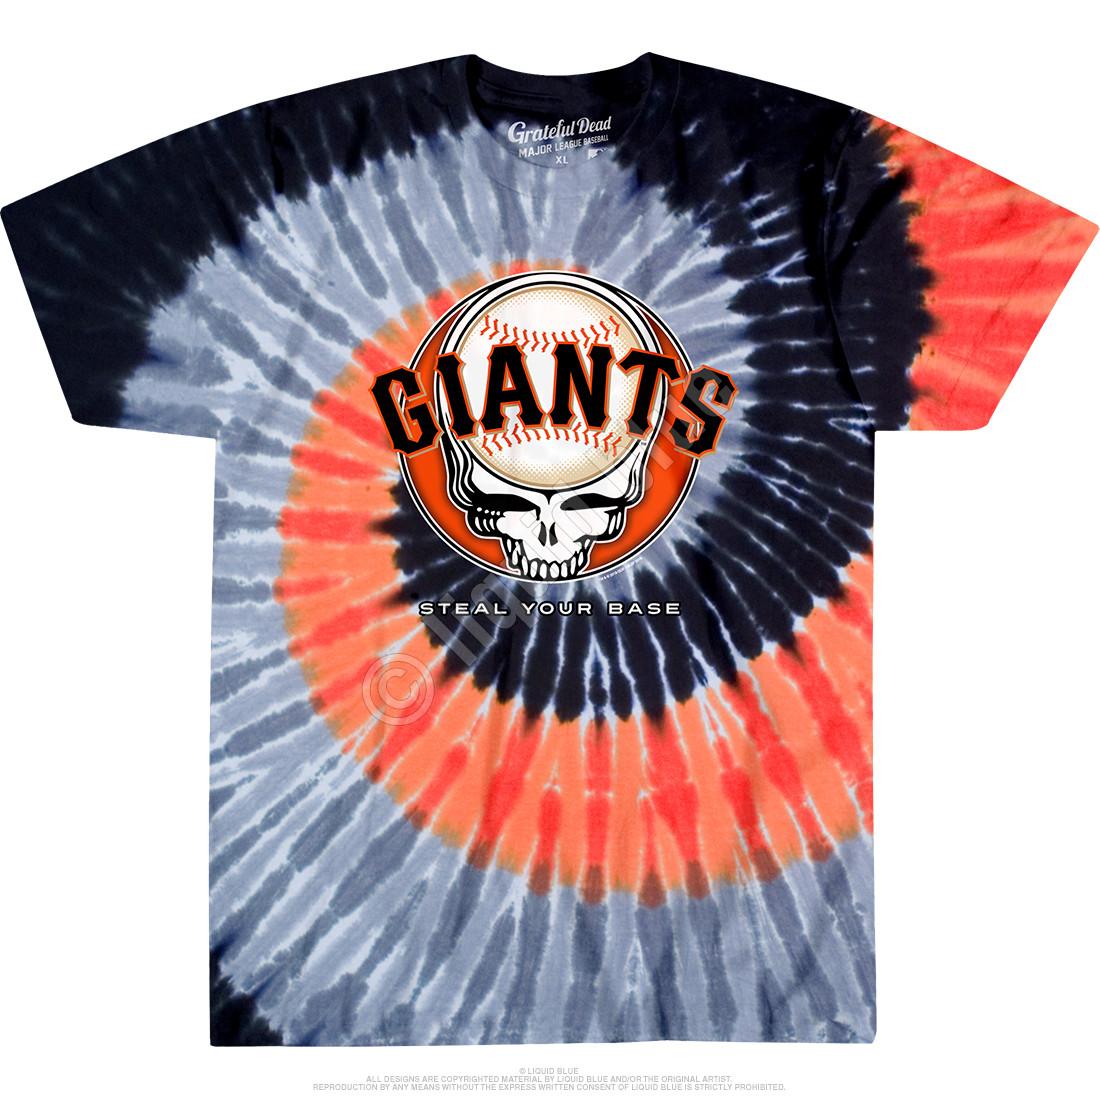 San Francisco Giants Steal Your Base Tie-Dye T-Shirt